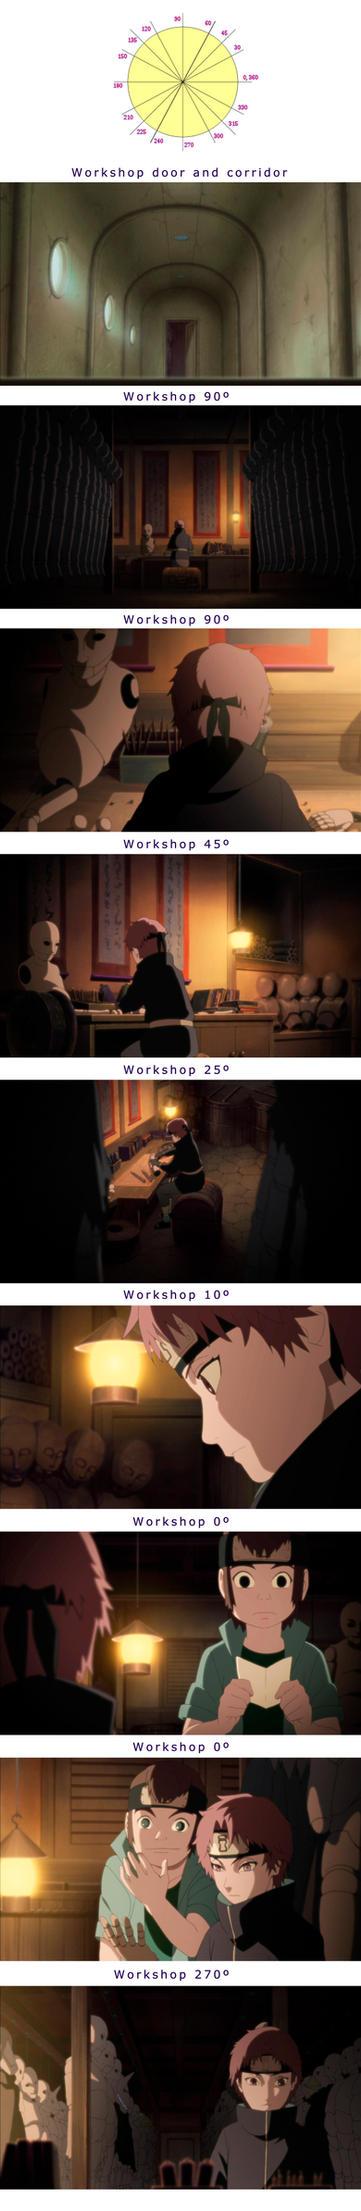 Sasori's Workshop by Kaoyux